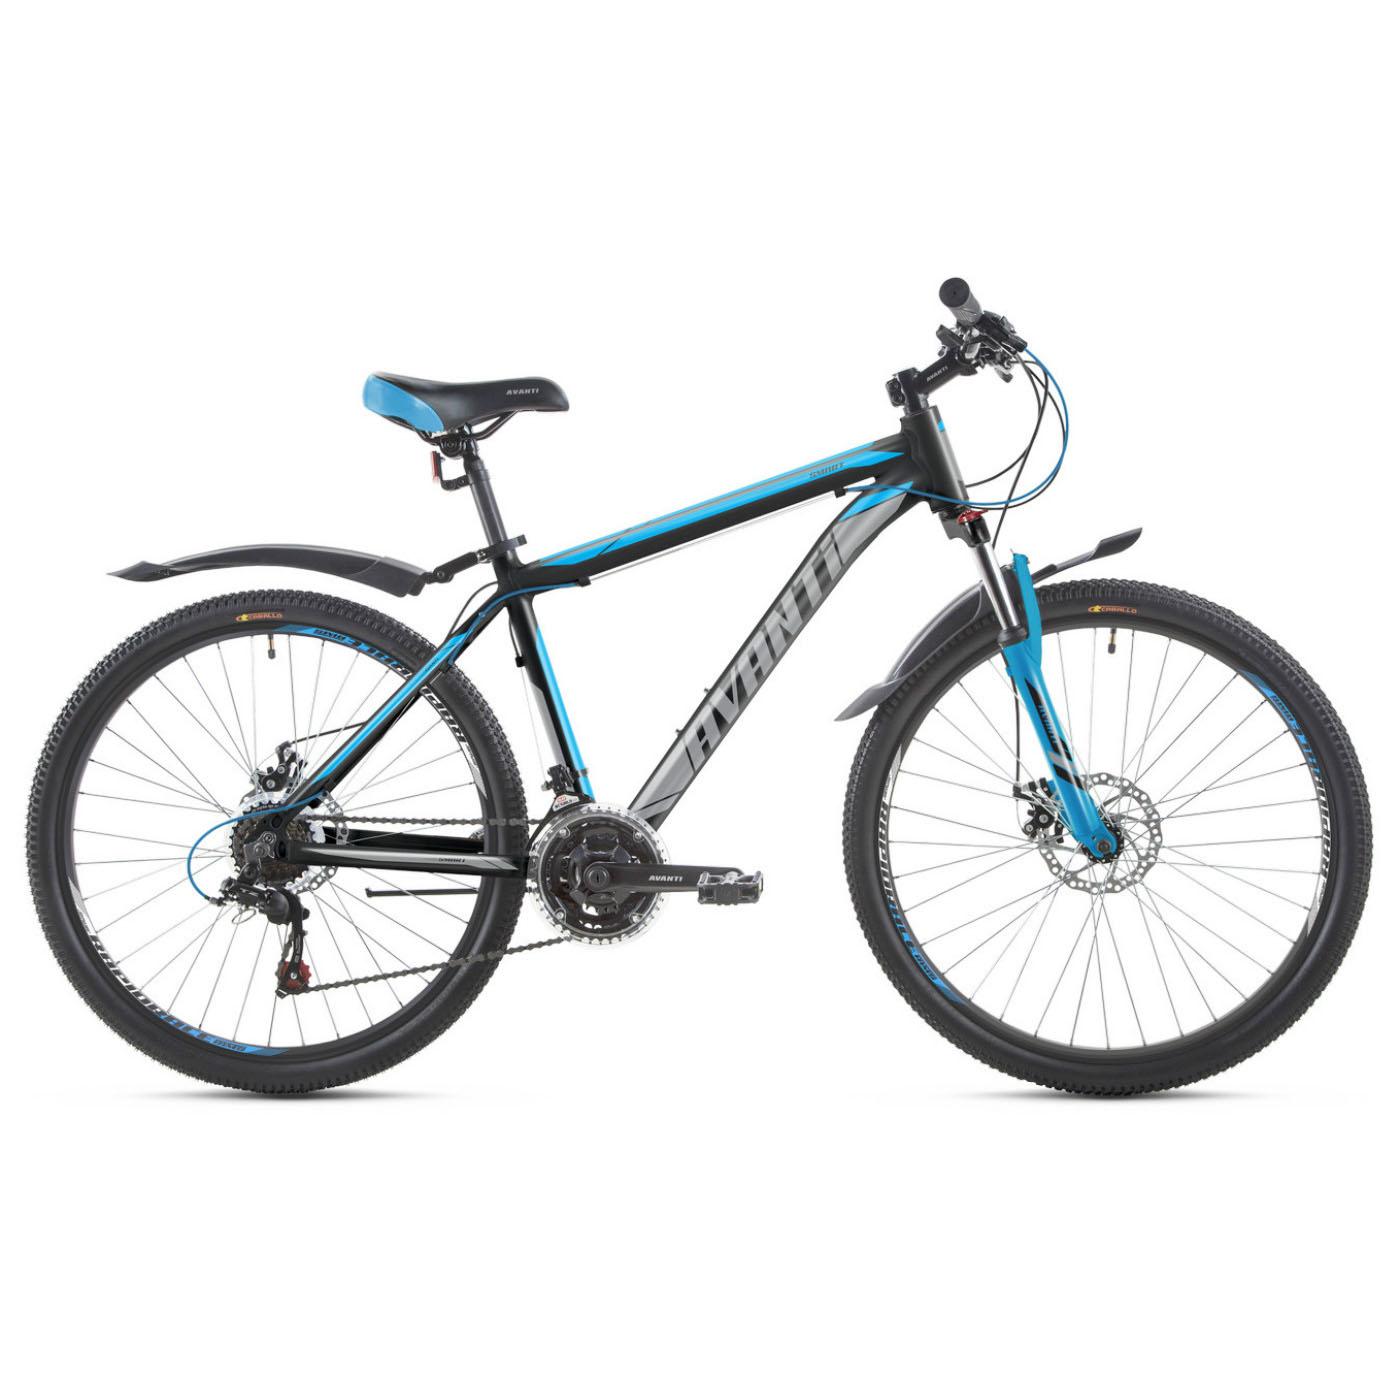 Фото Горный Велосипед   26 Avanti Smart disk 2018 вилка Lock Out черно-синий